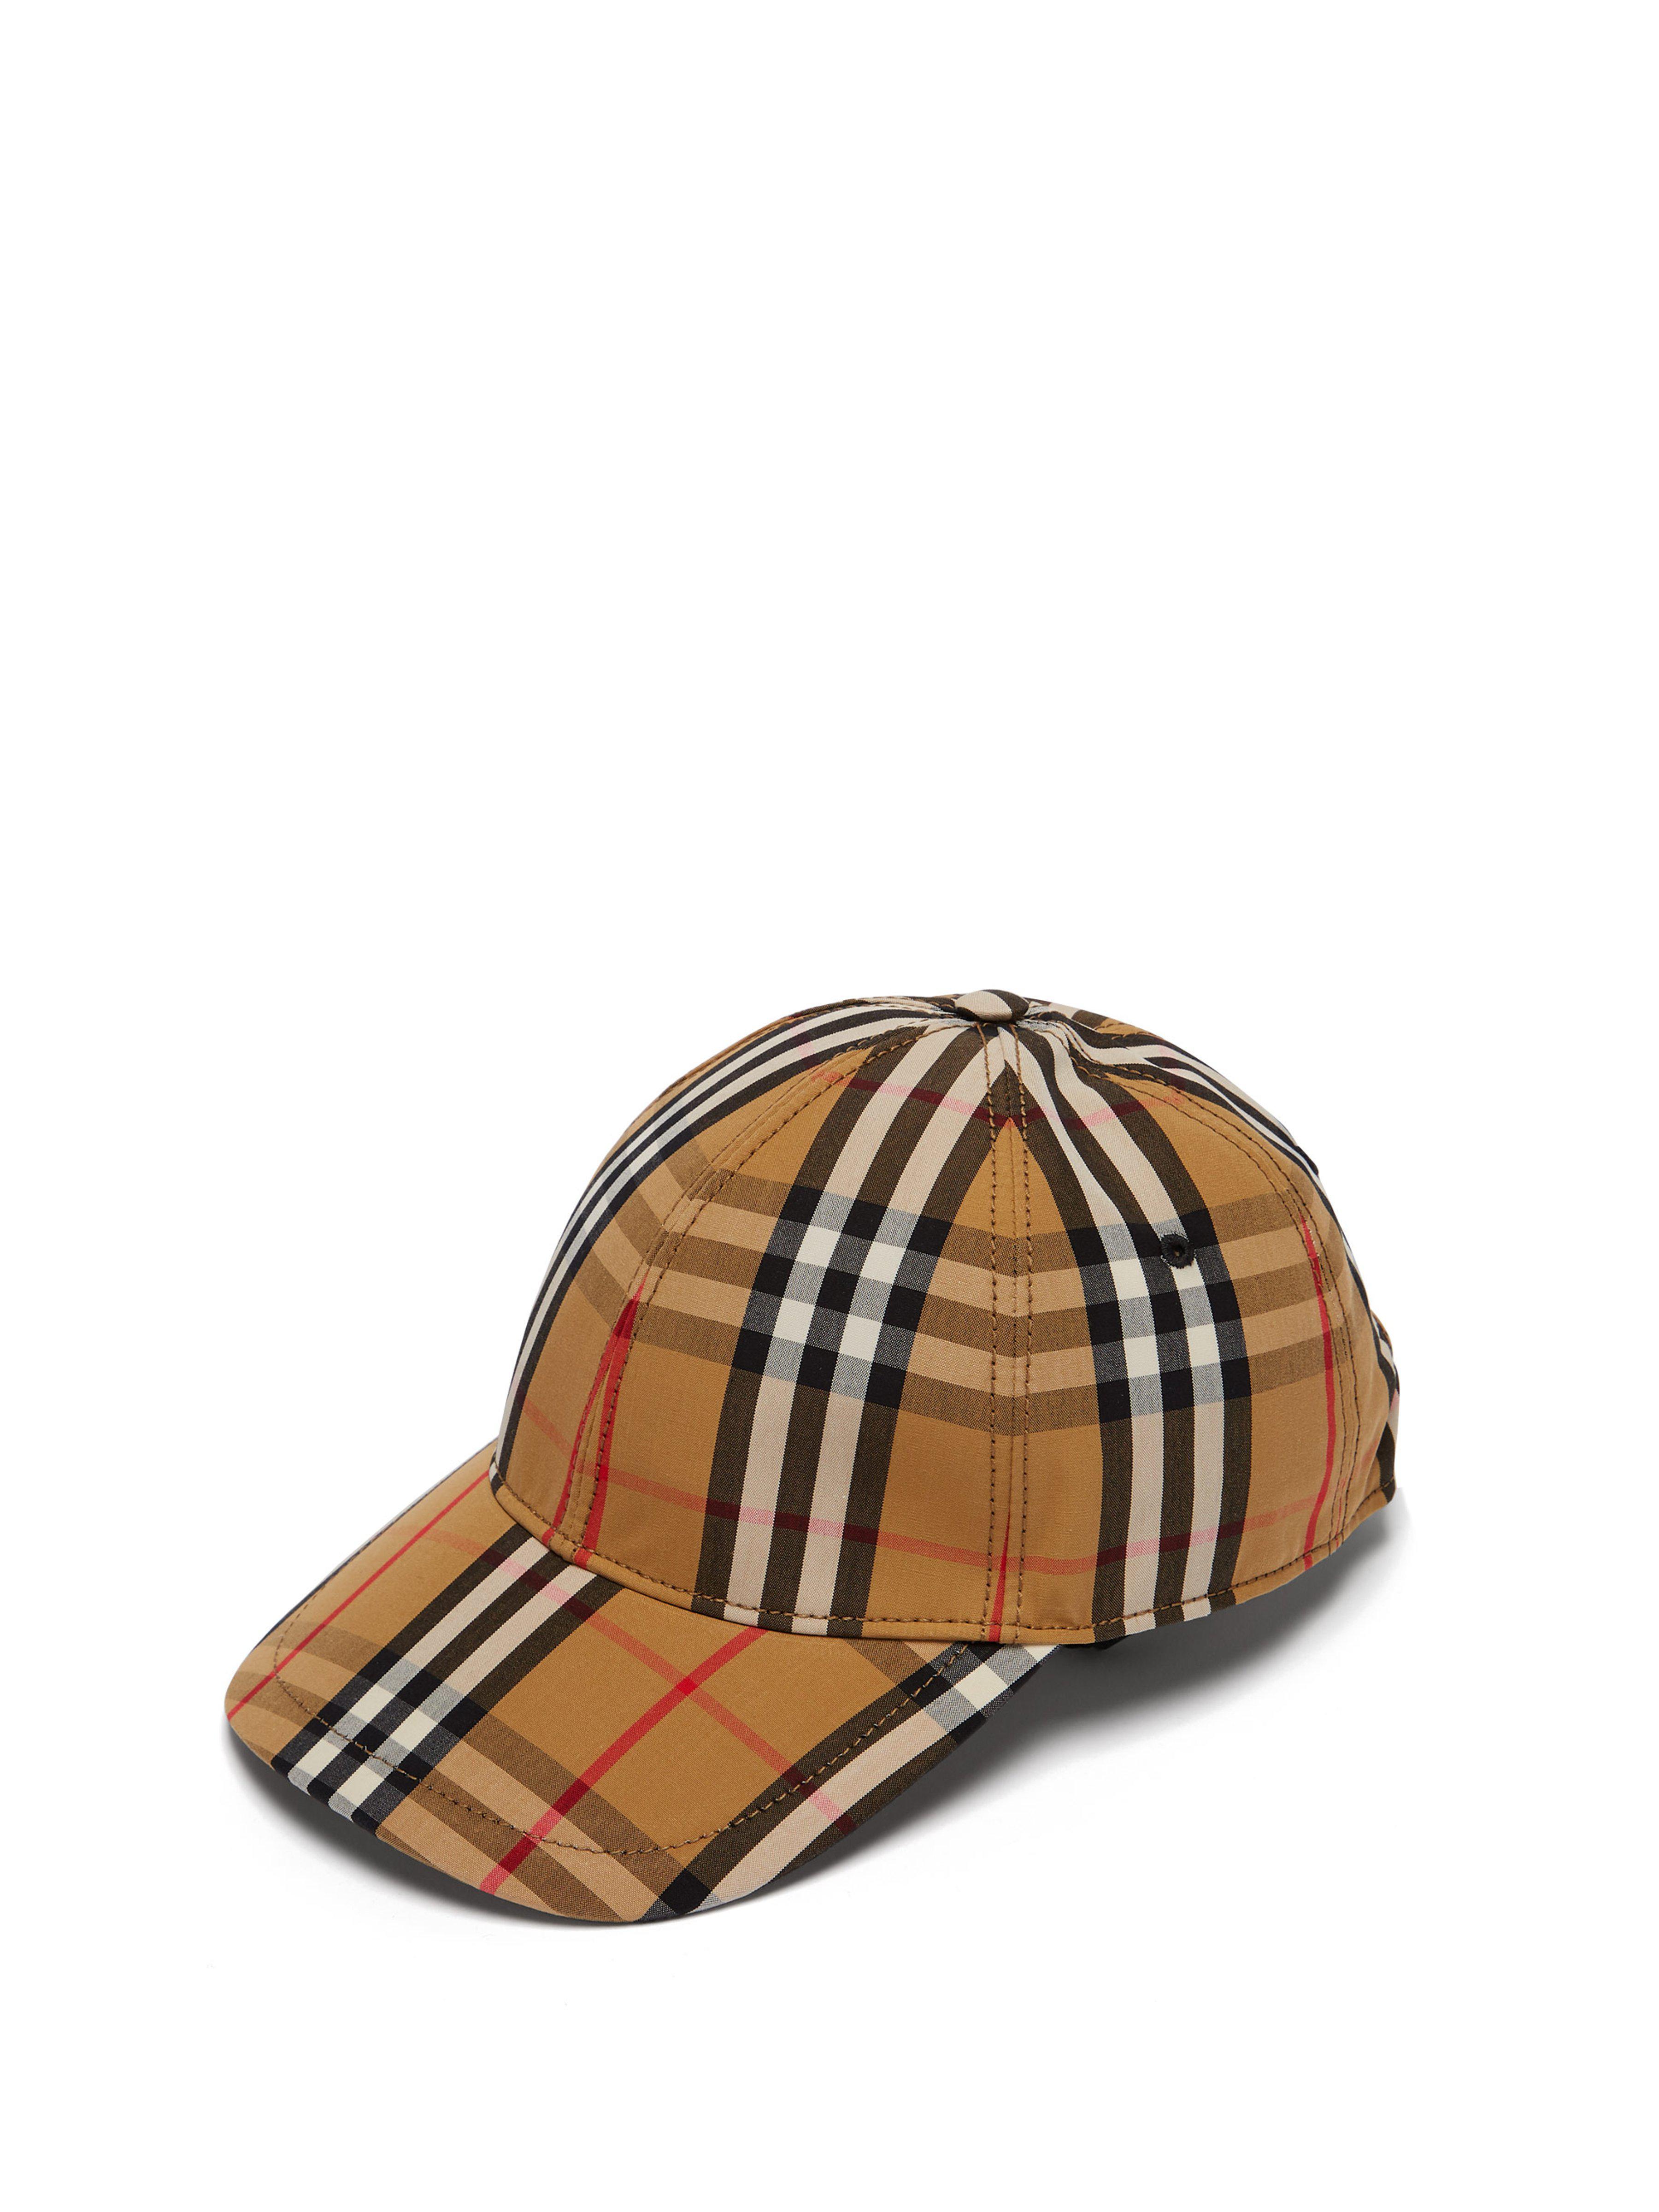 022dc049 Burberry Vintage Check Cotton Baseball Cap - Save 11% - Lyst